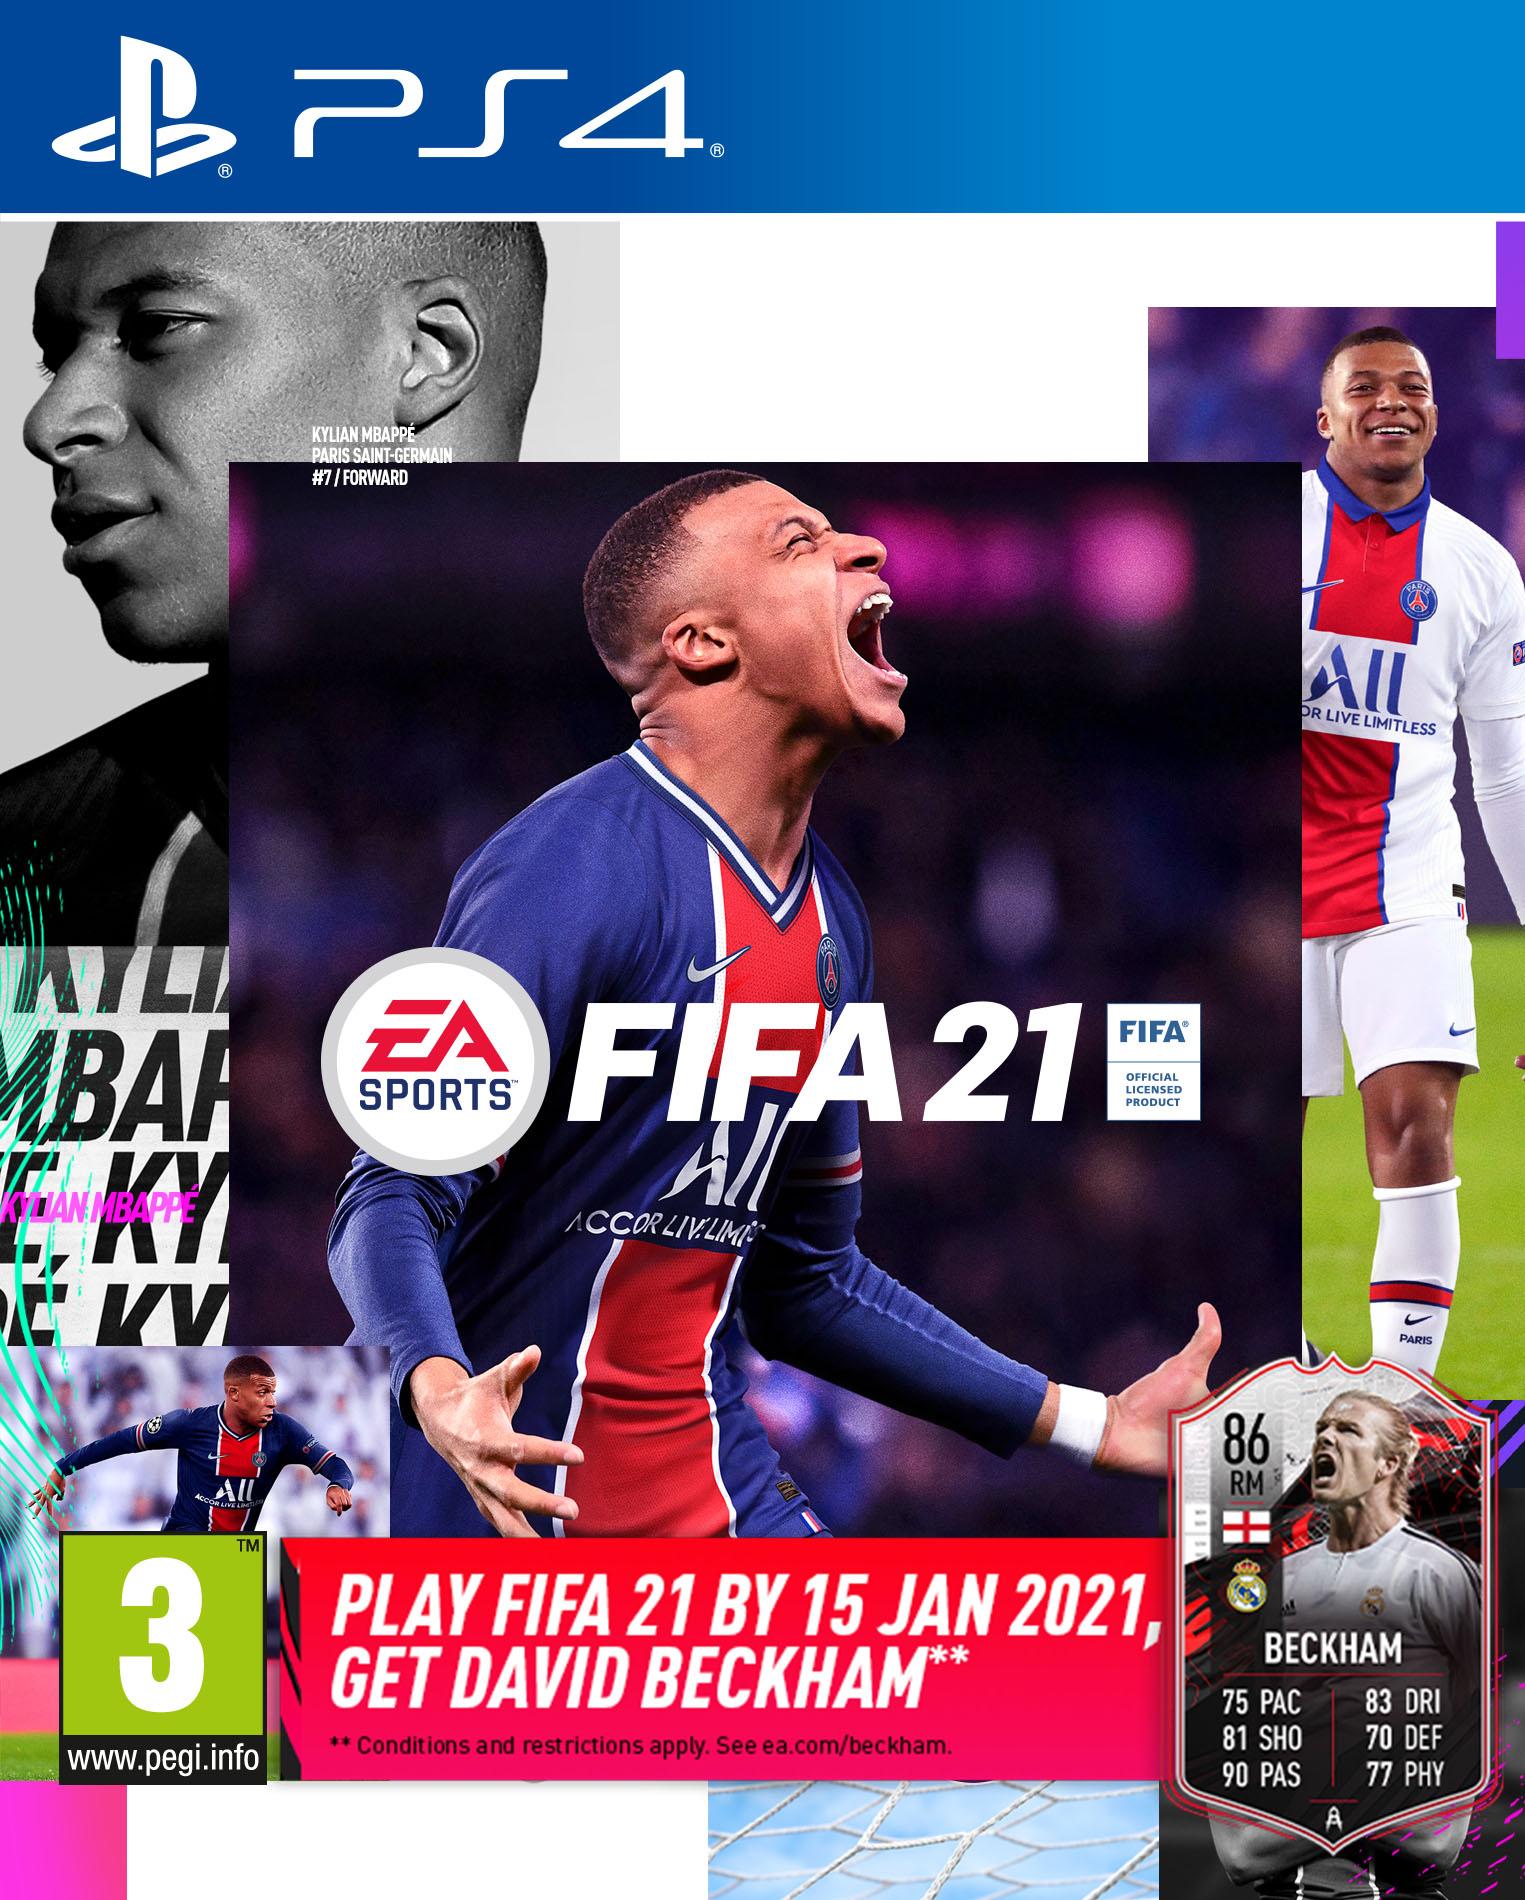 coolshop.co.uk - FIFA 21